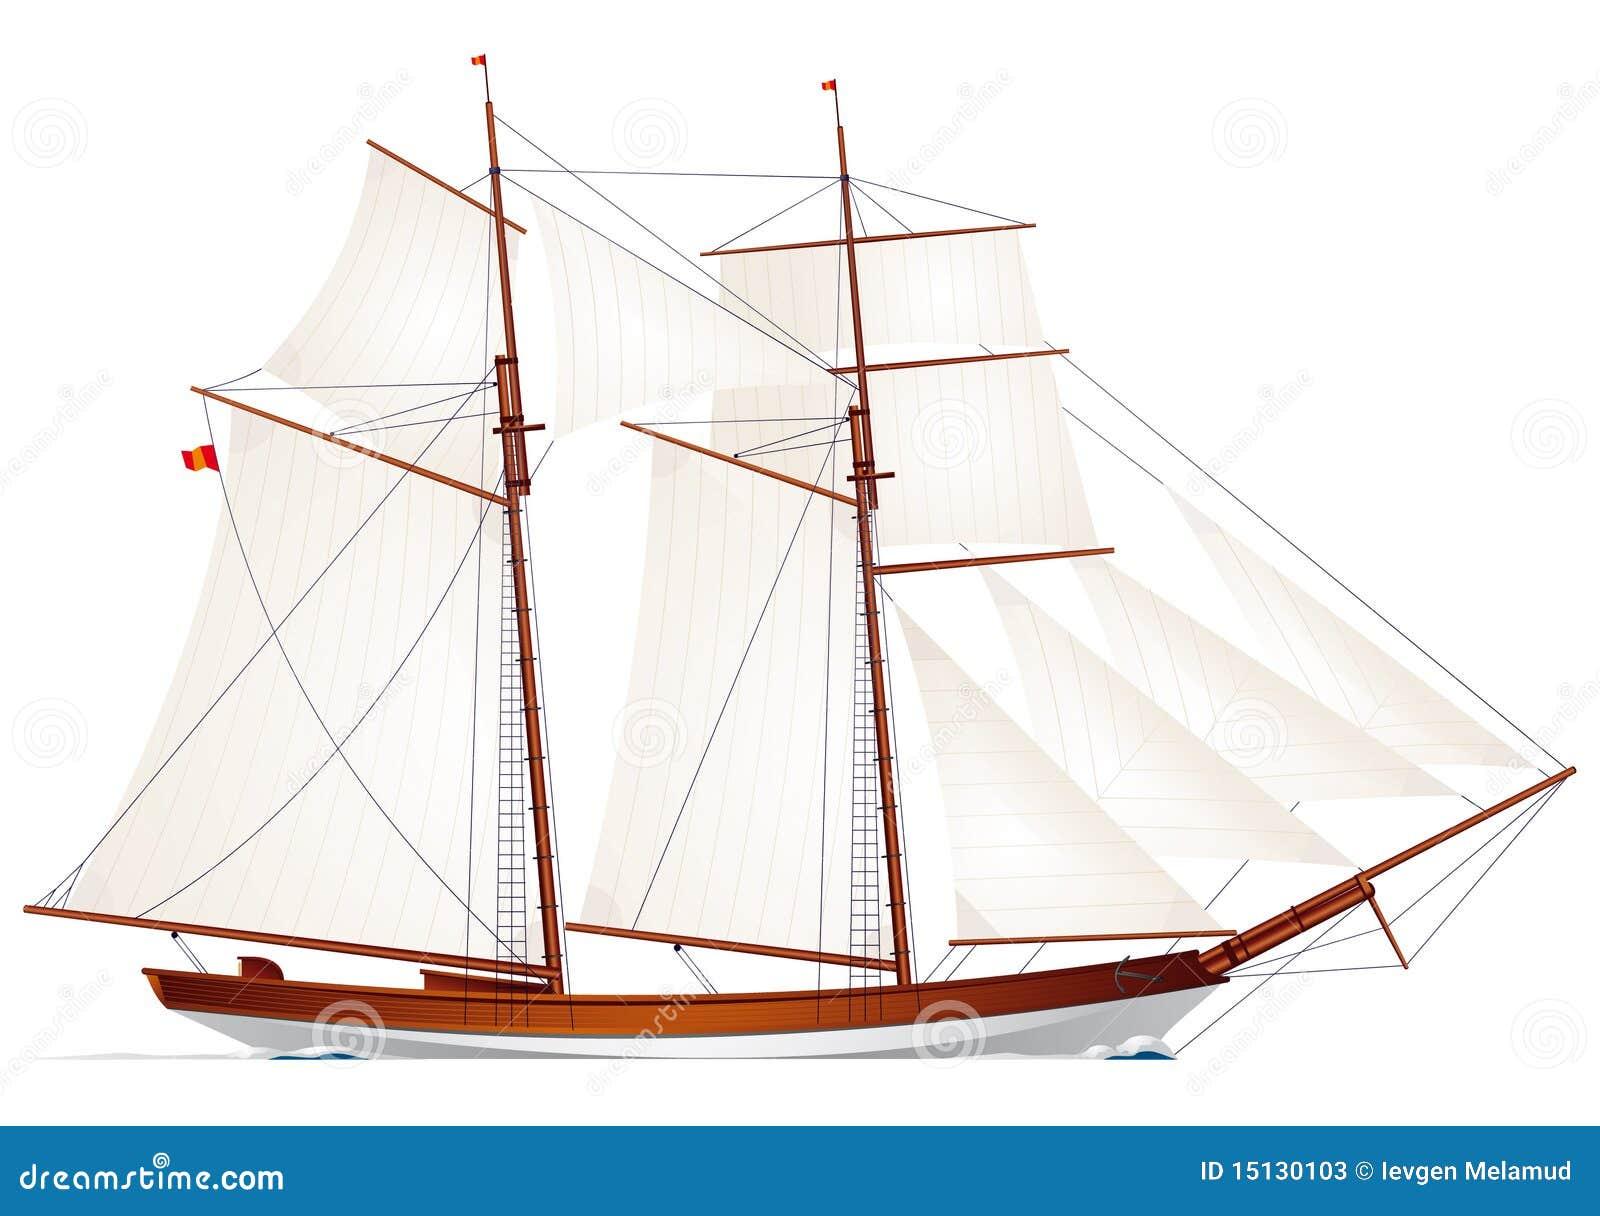 SchoenerZeilbootVarend SchoenerZeilbootVarend Schip SchoenerZeilbootVarend Illustratie Vector Schip Vector Illustratie tQrshd